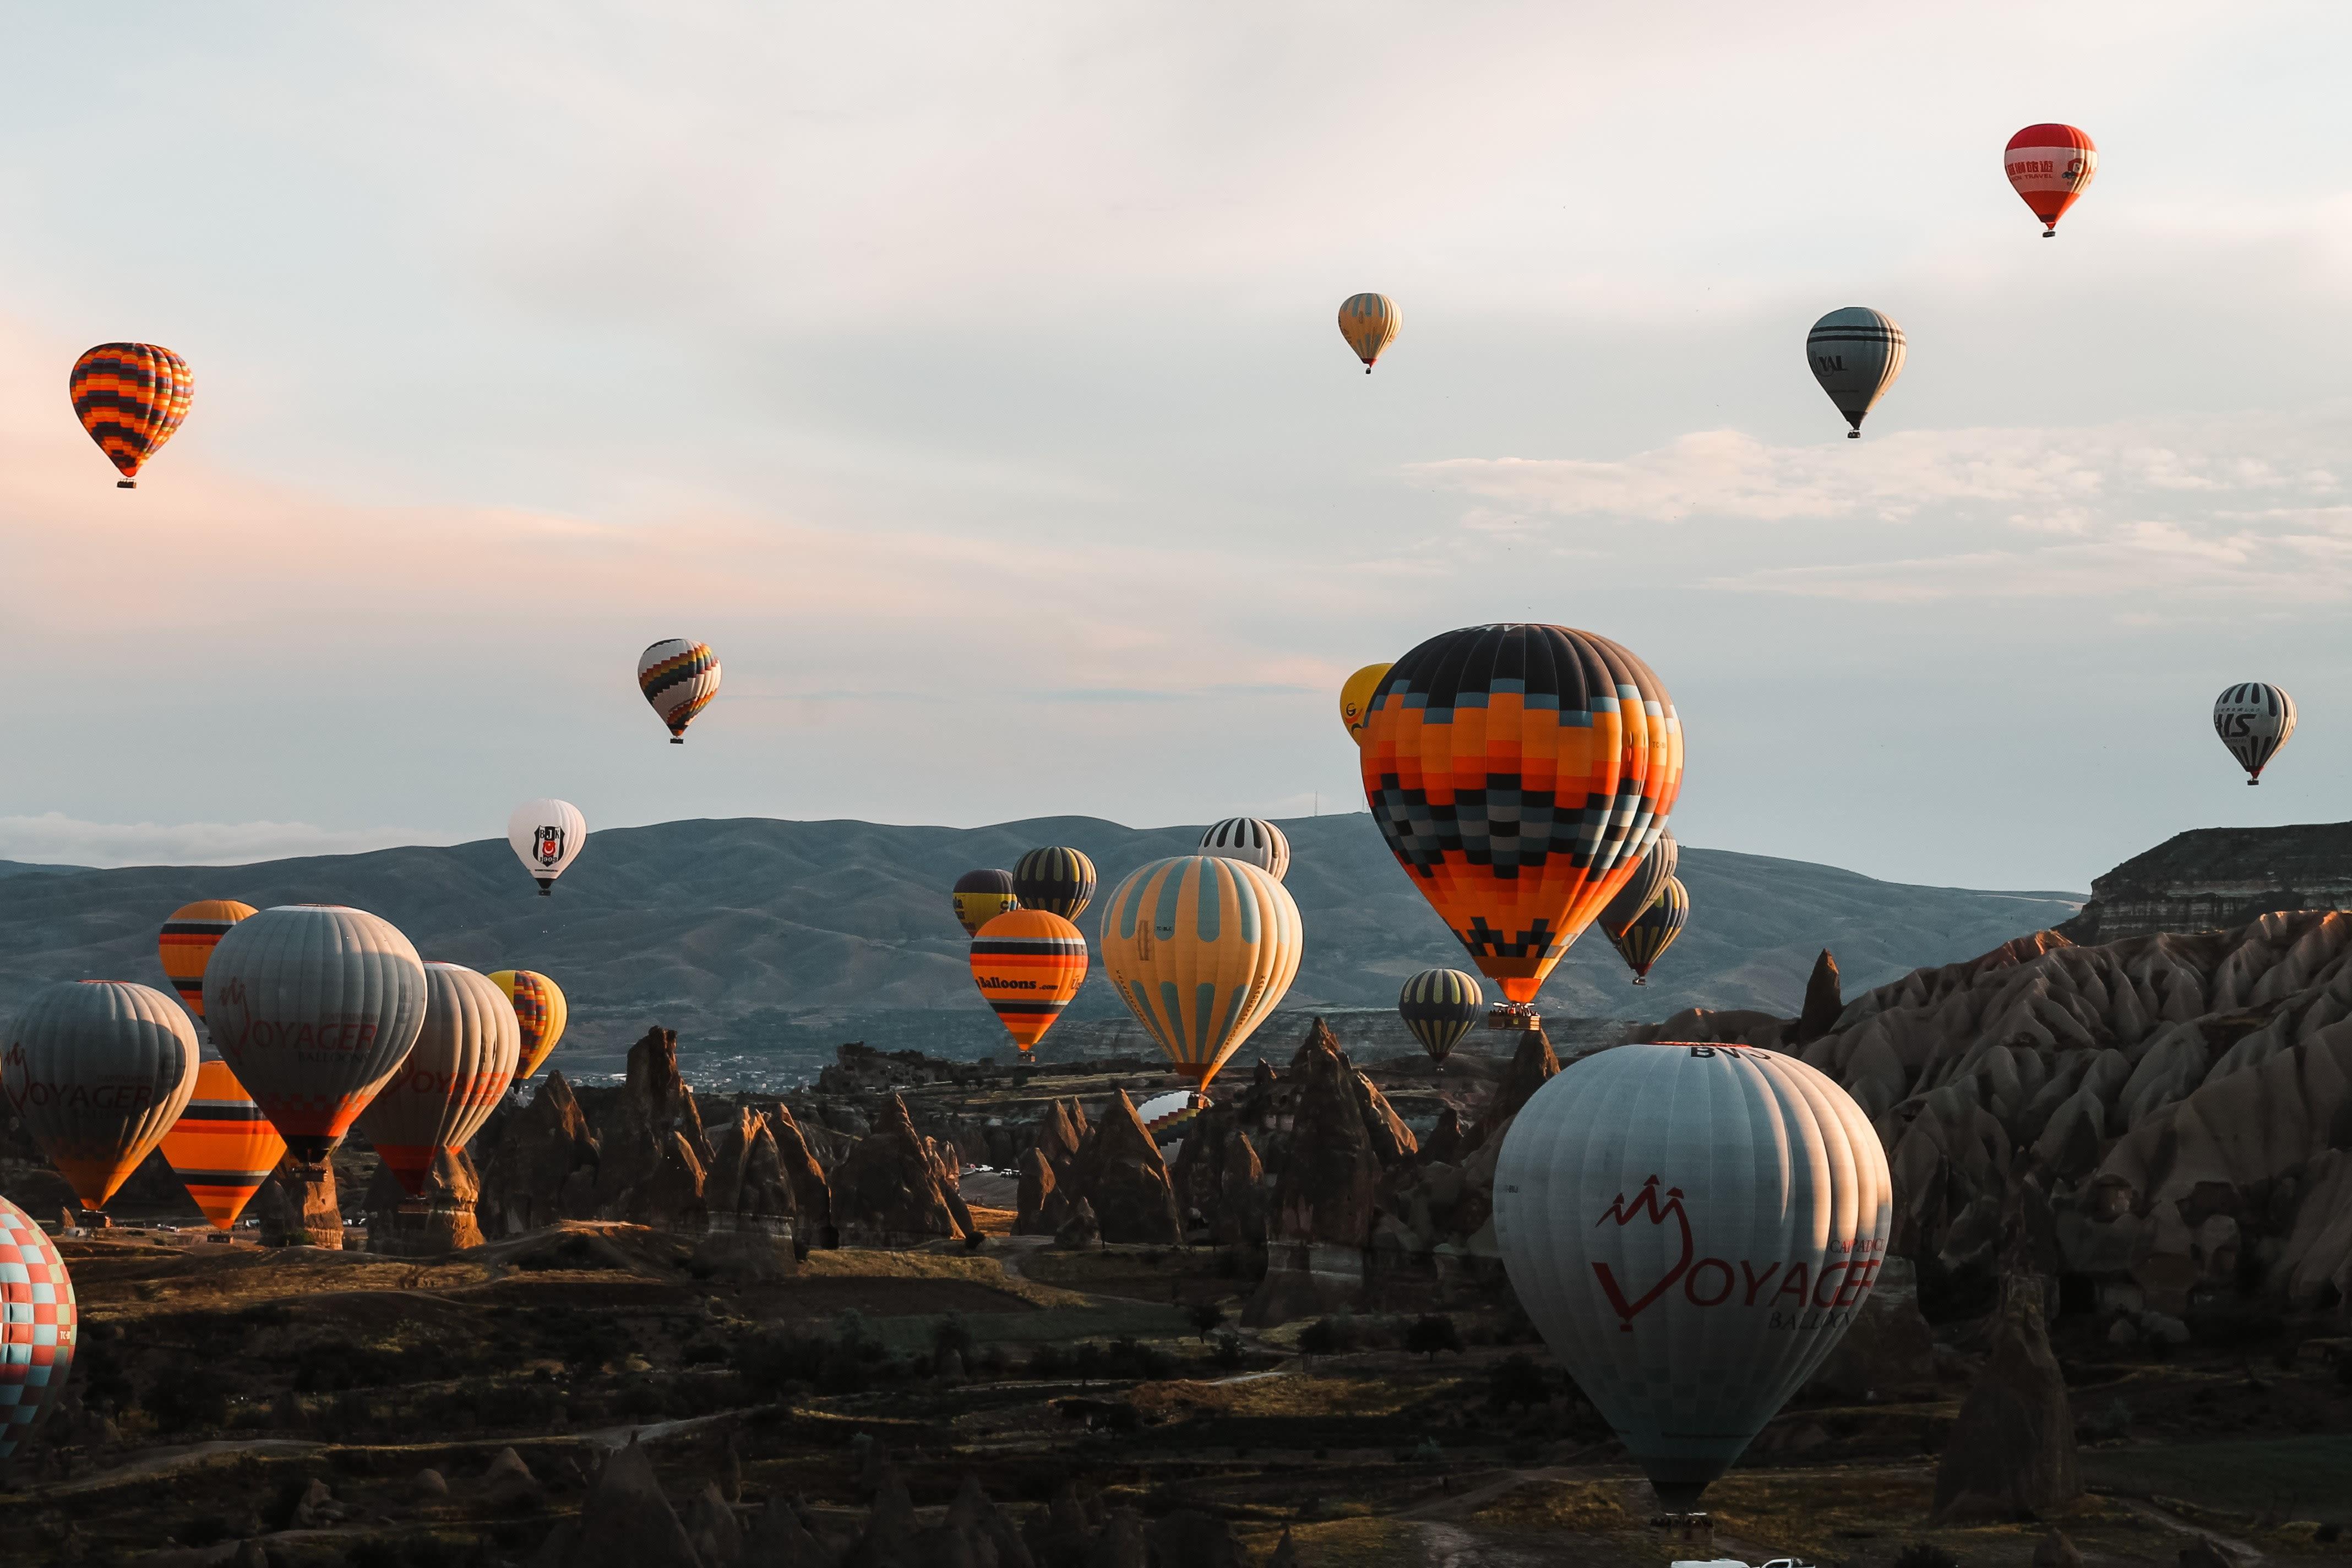 Explore the magical sights of Cappadocia, Turkey Image